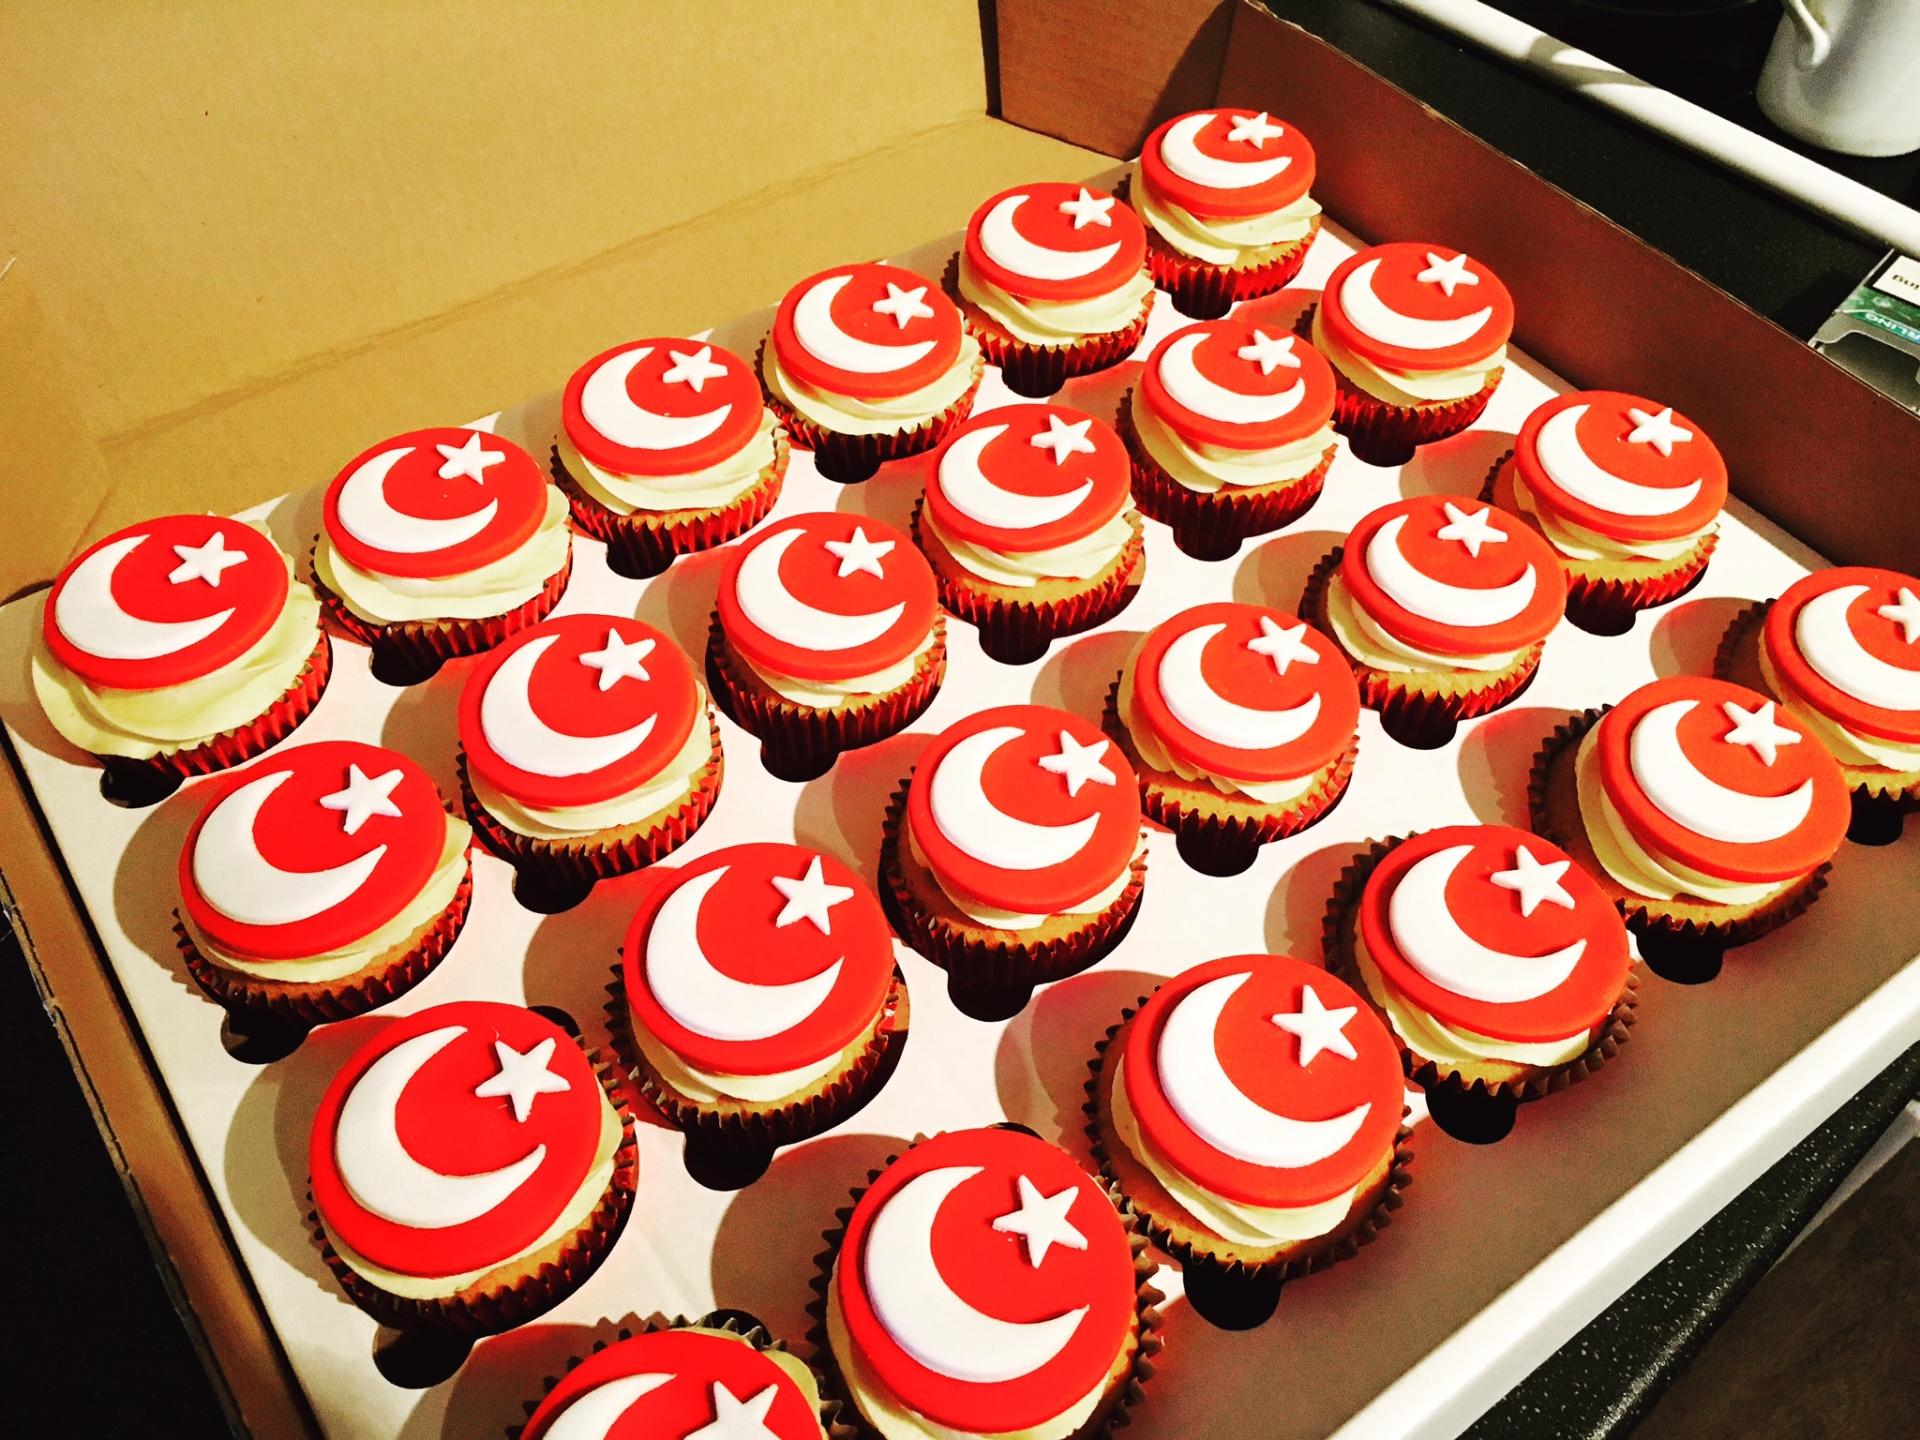 Turkish flag cupcakes